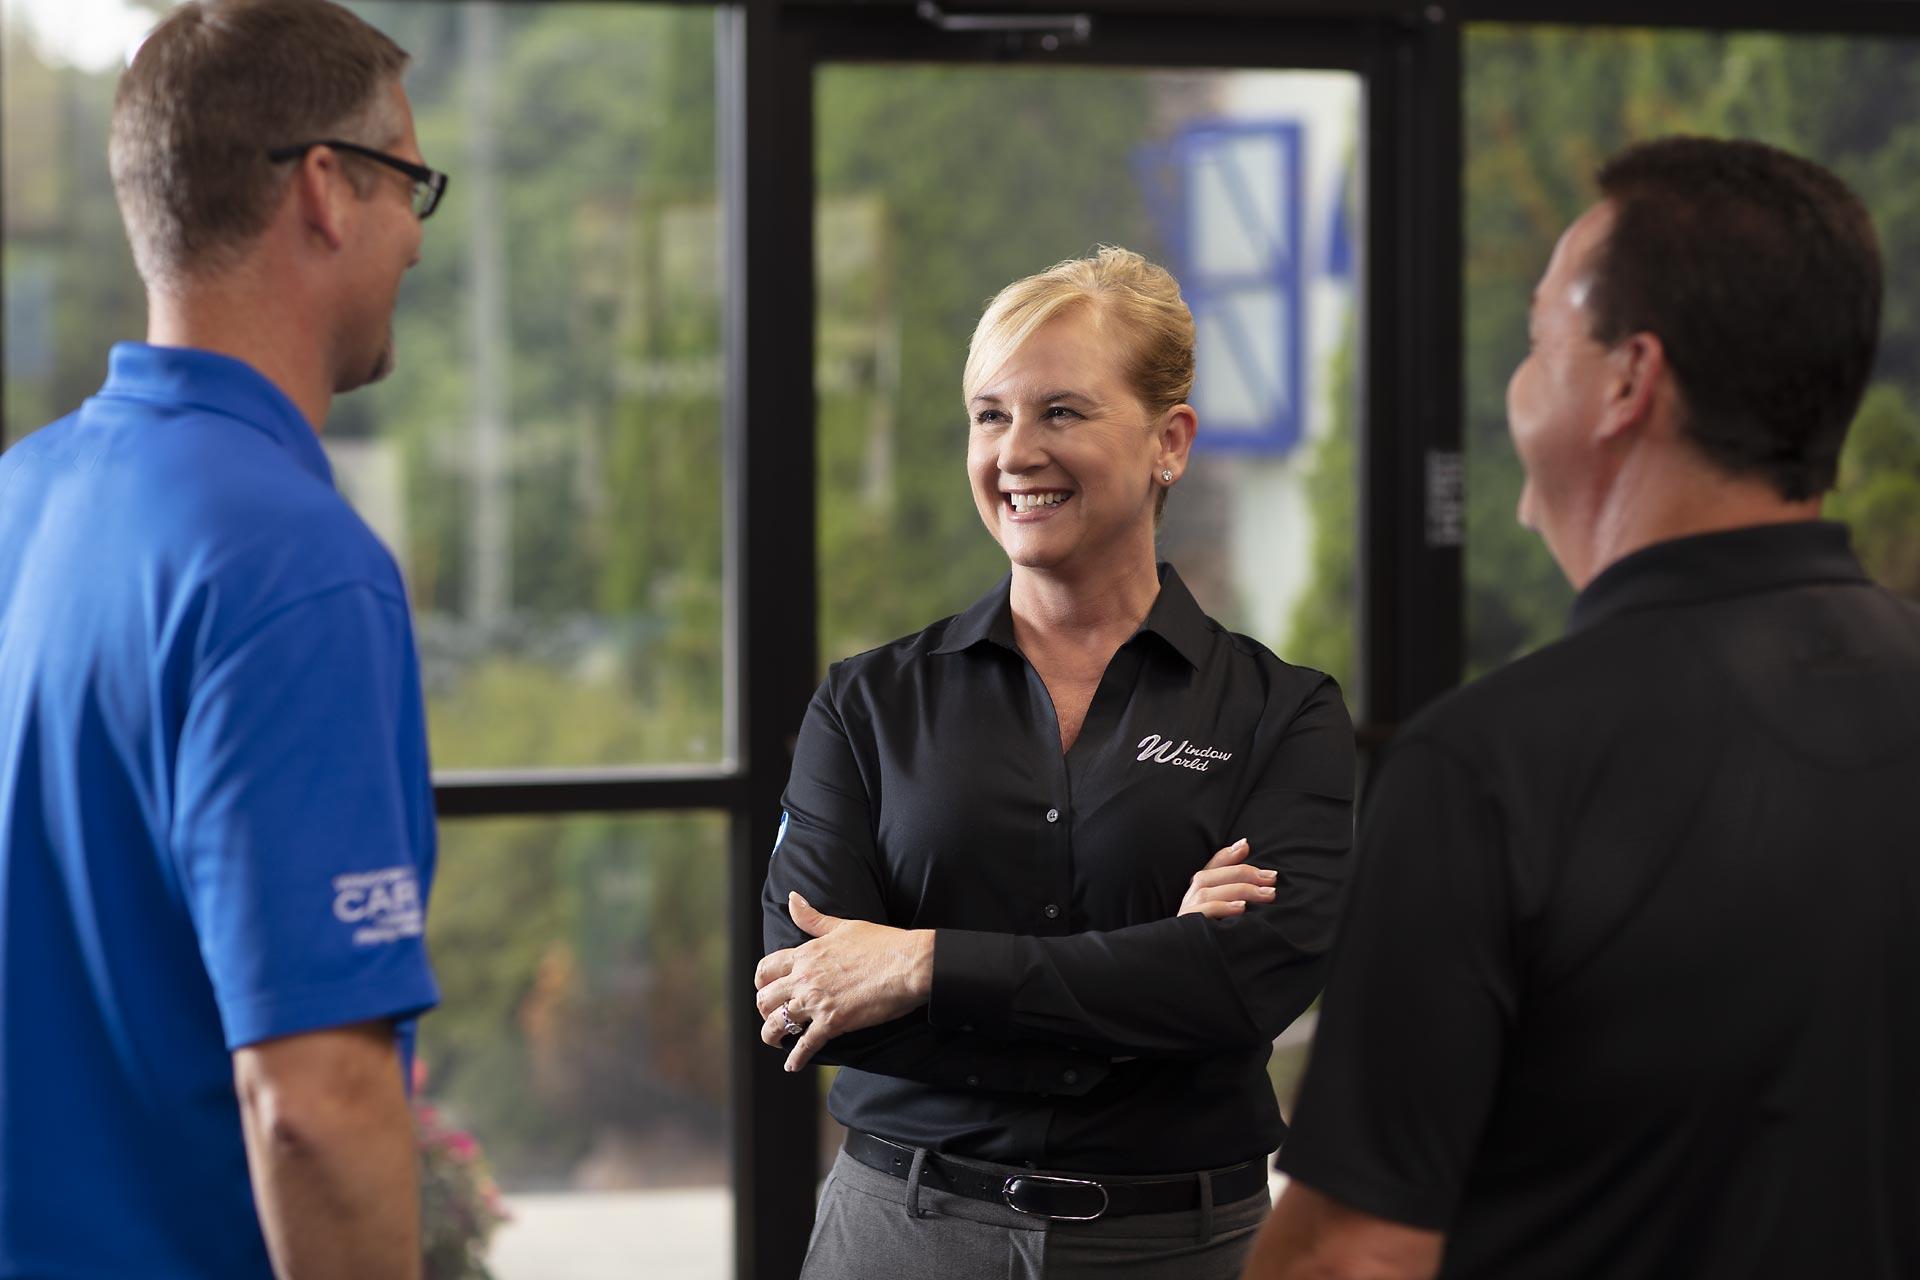 Window World CEO Tammy Whitworth with staff